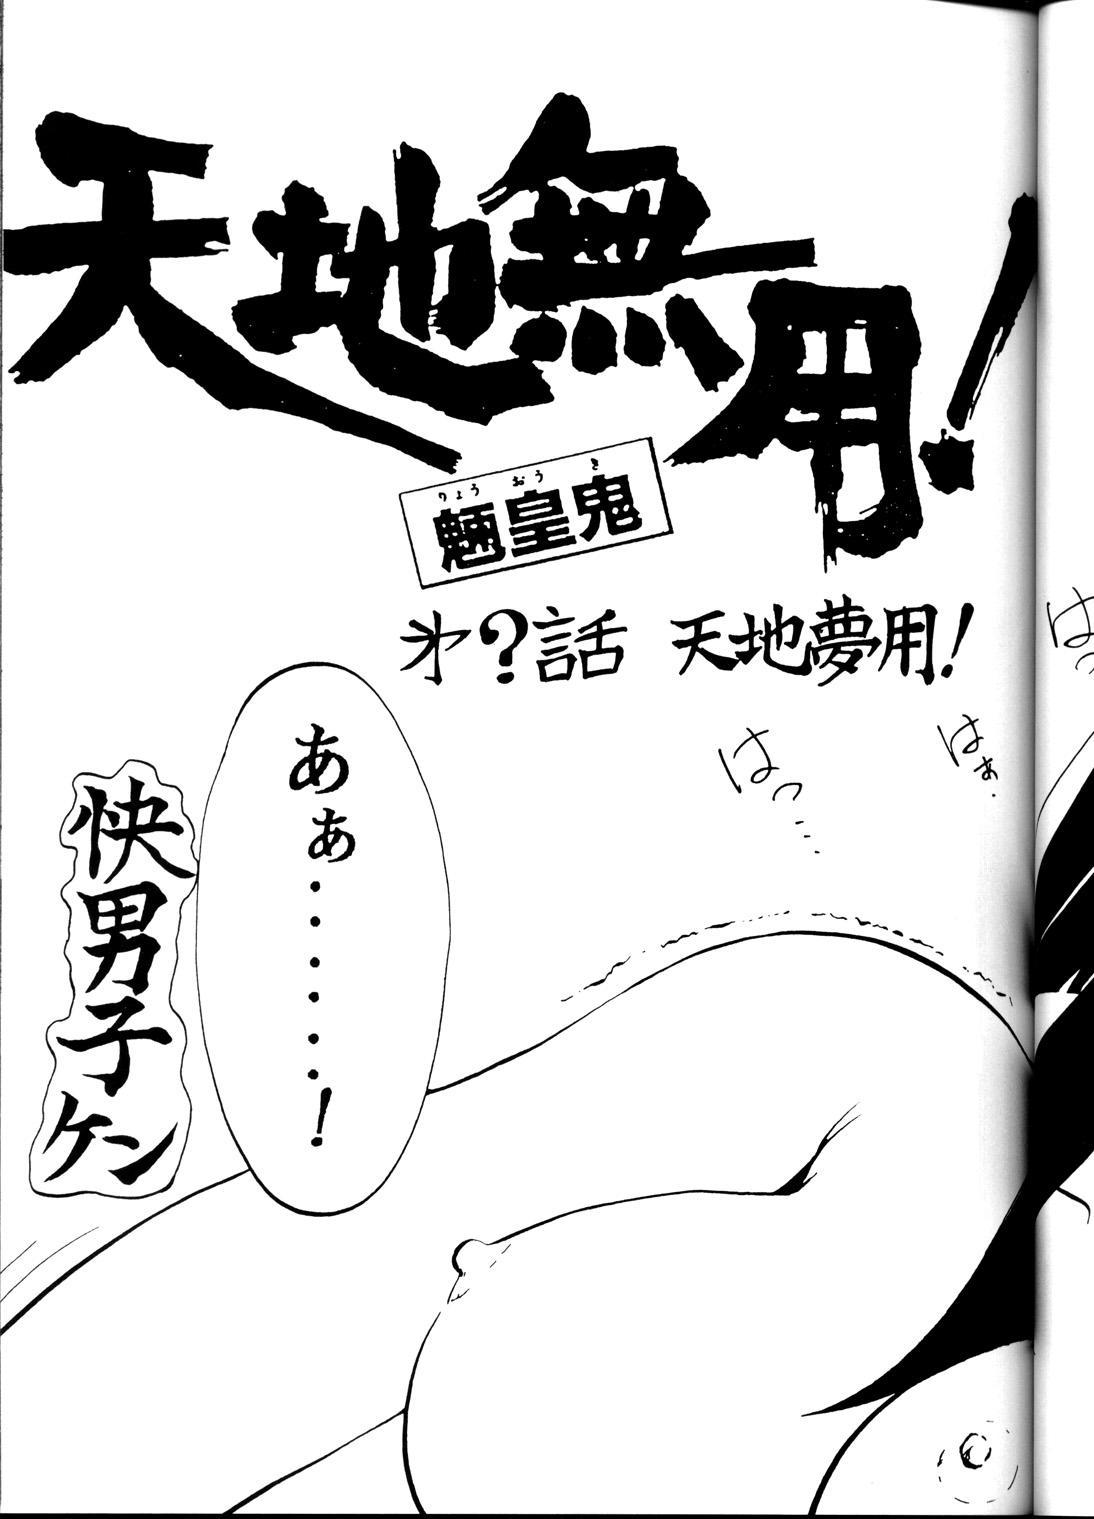 [B.B.C] Tenchi Muyou! Ryou-ou-ki Kaiteiben (Tenchi Muyou!) 37